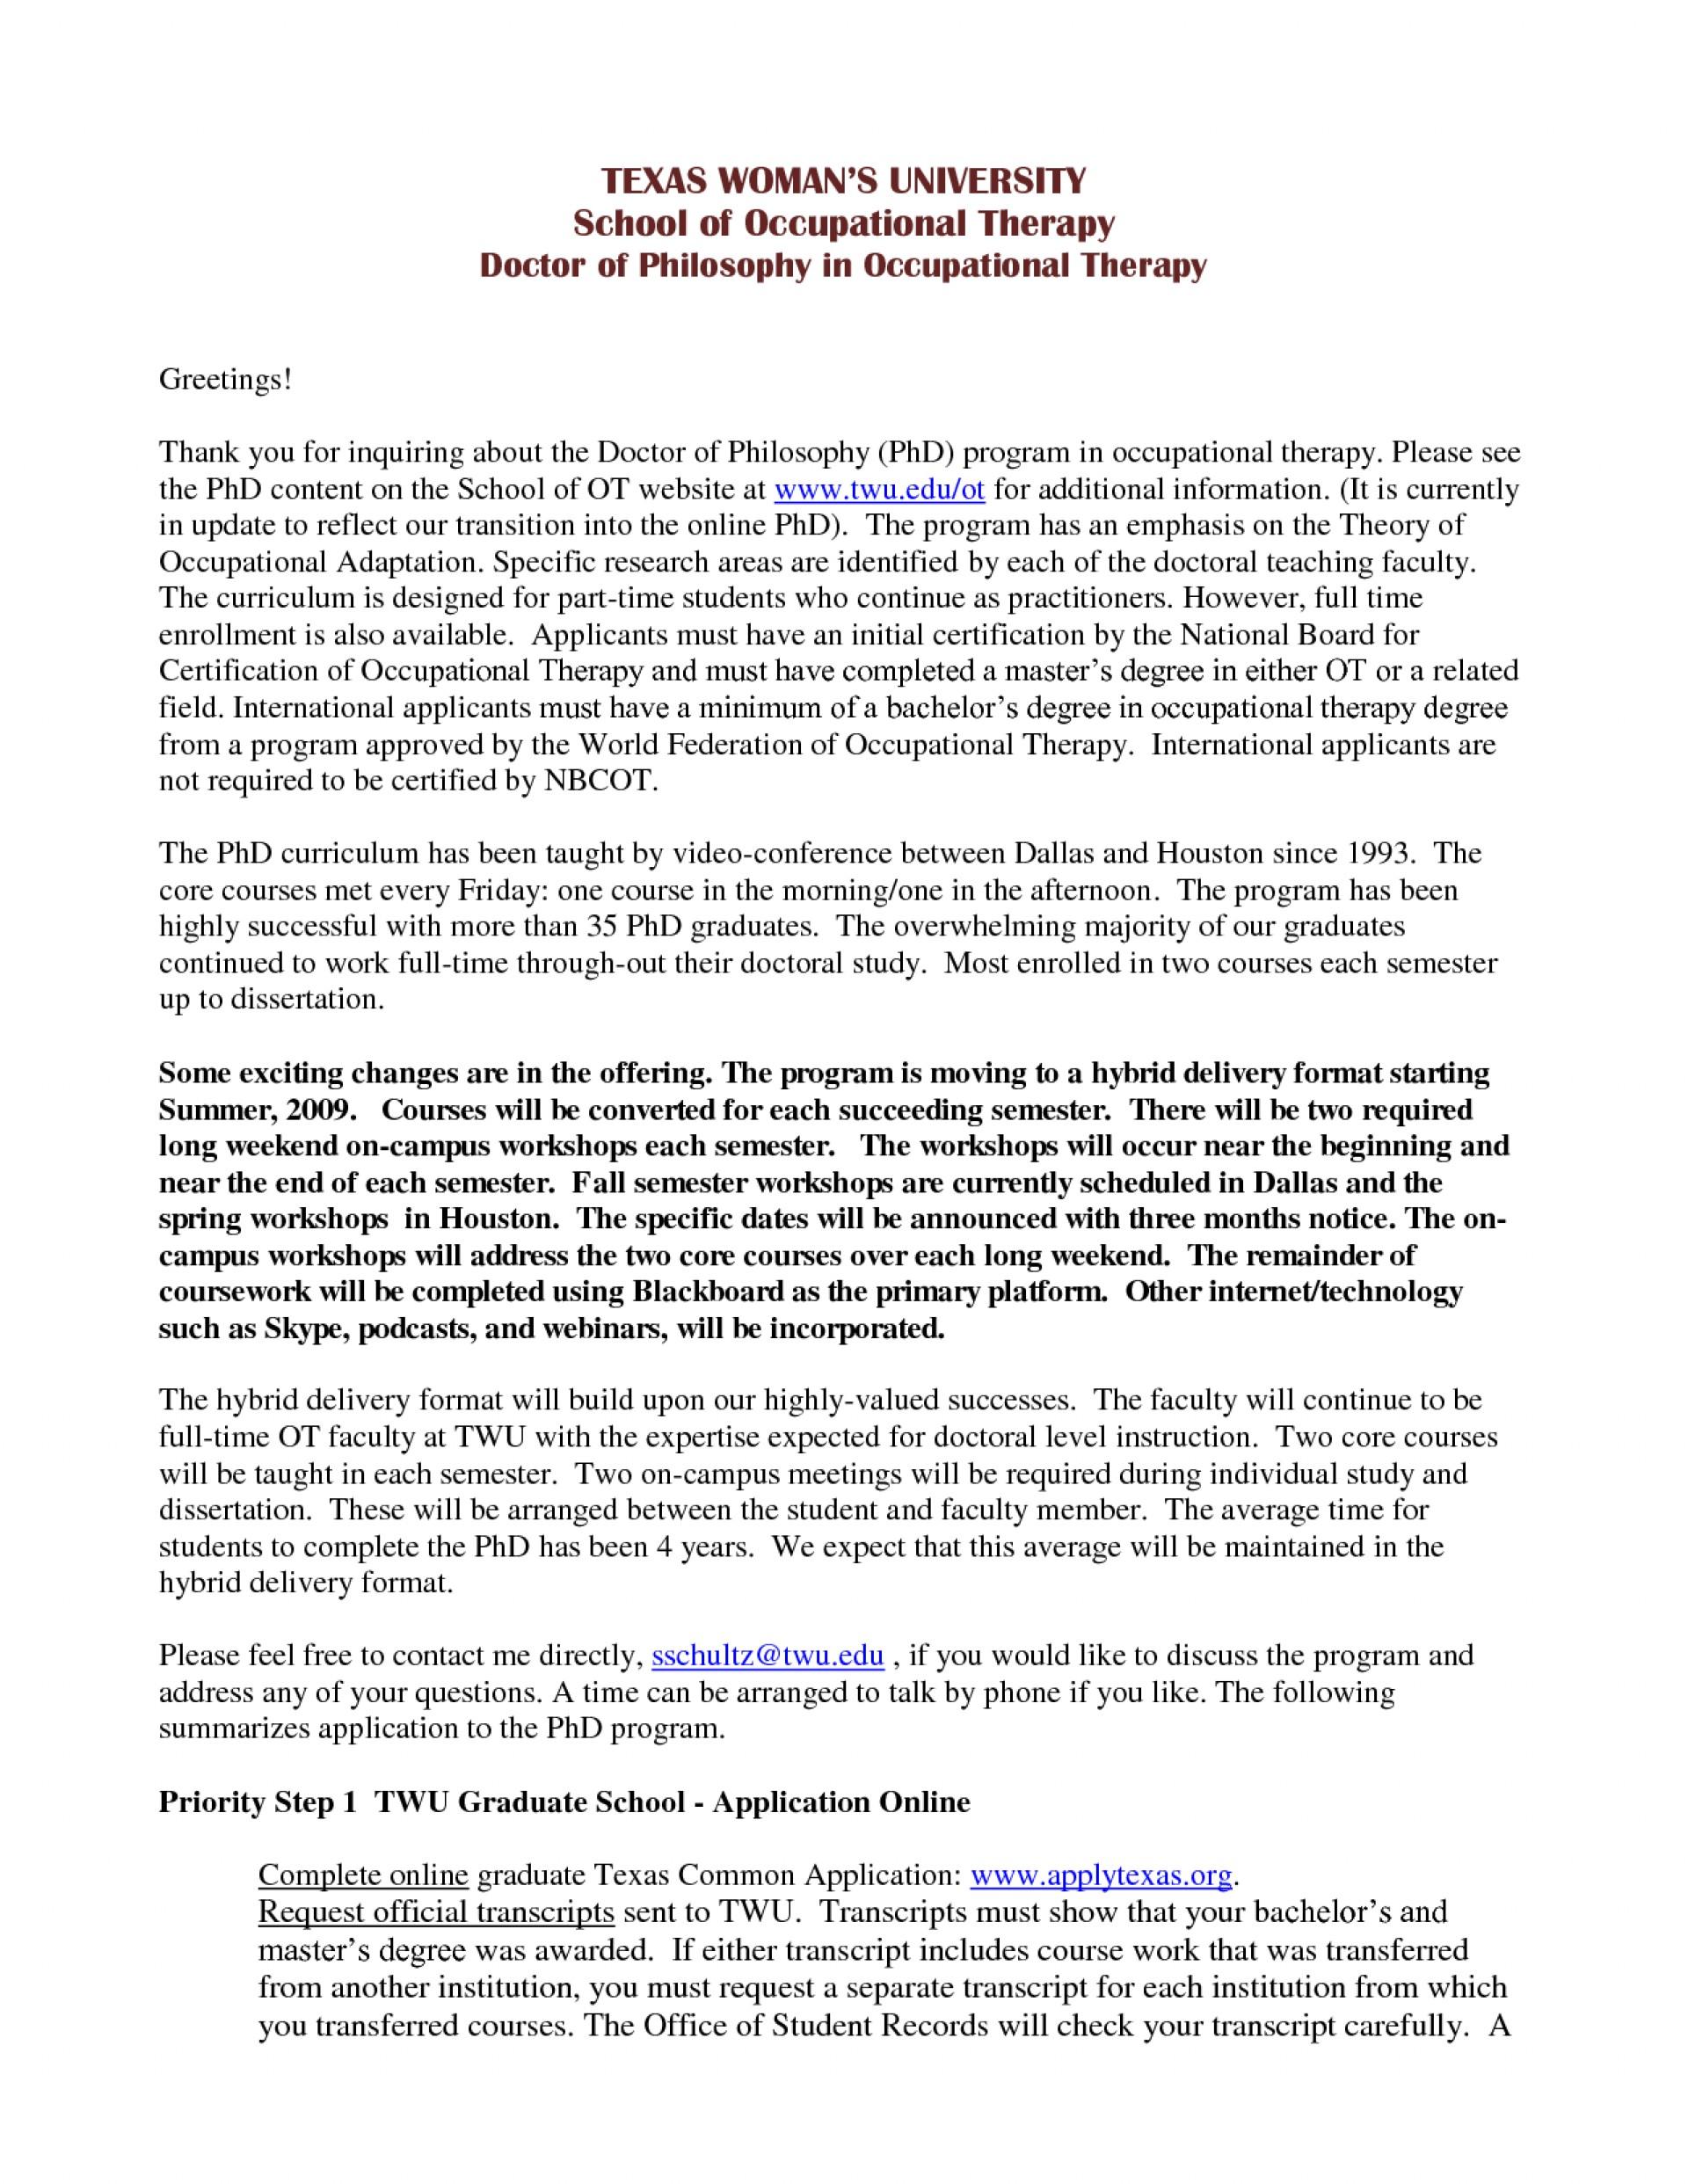 006 P2nuwjbgnb Essay Example Common App Examples Phenomenal 2017 Prompts 1920